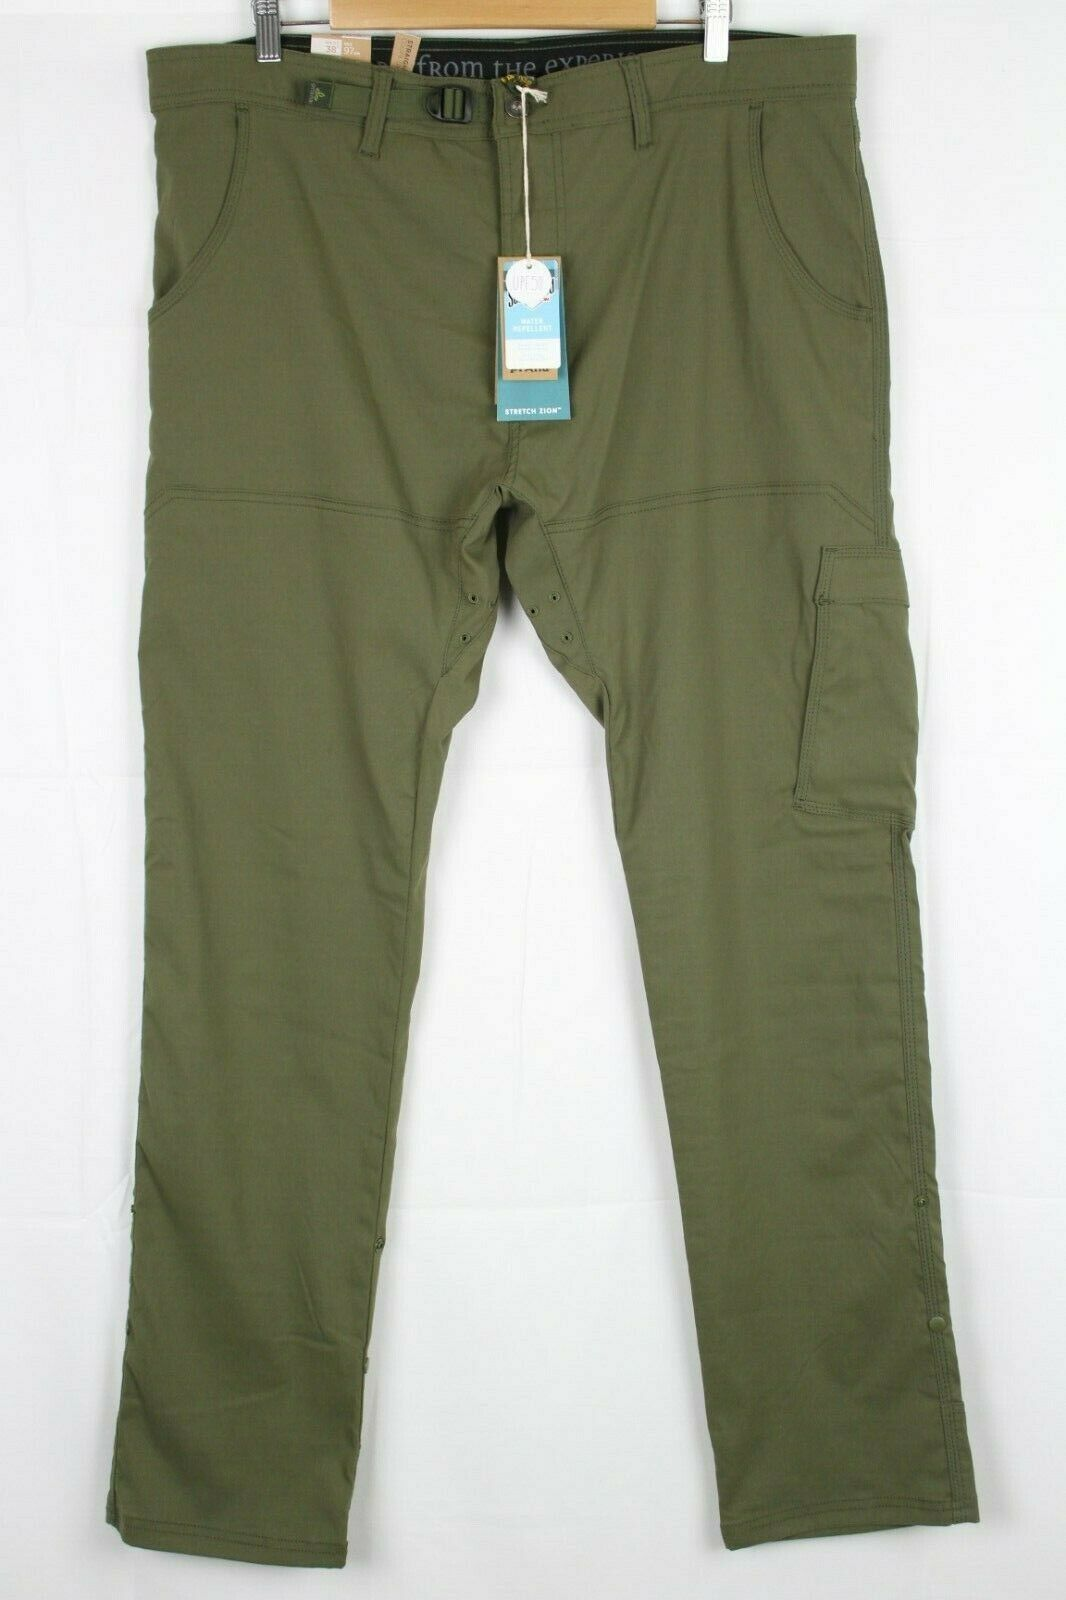 New Prana Men's Stretch Zion Straight Leg Pants 38 x 34 Cargo Green M43183427